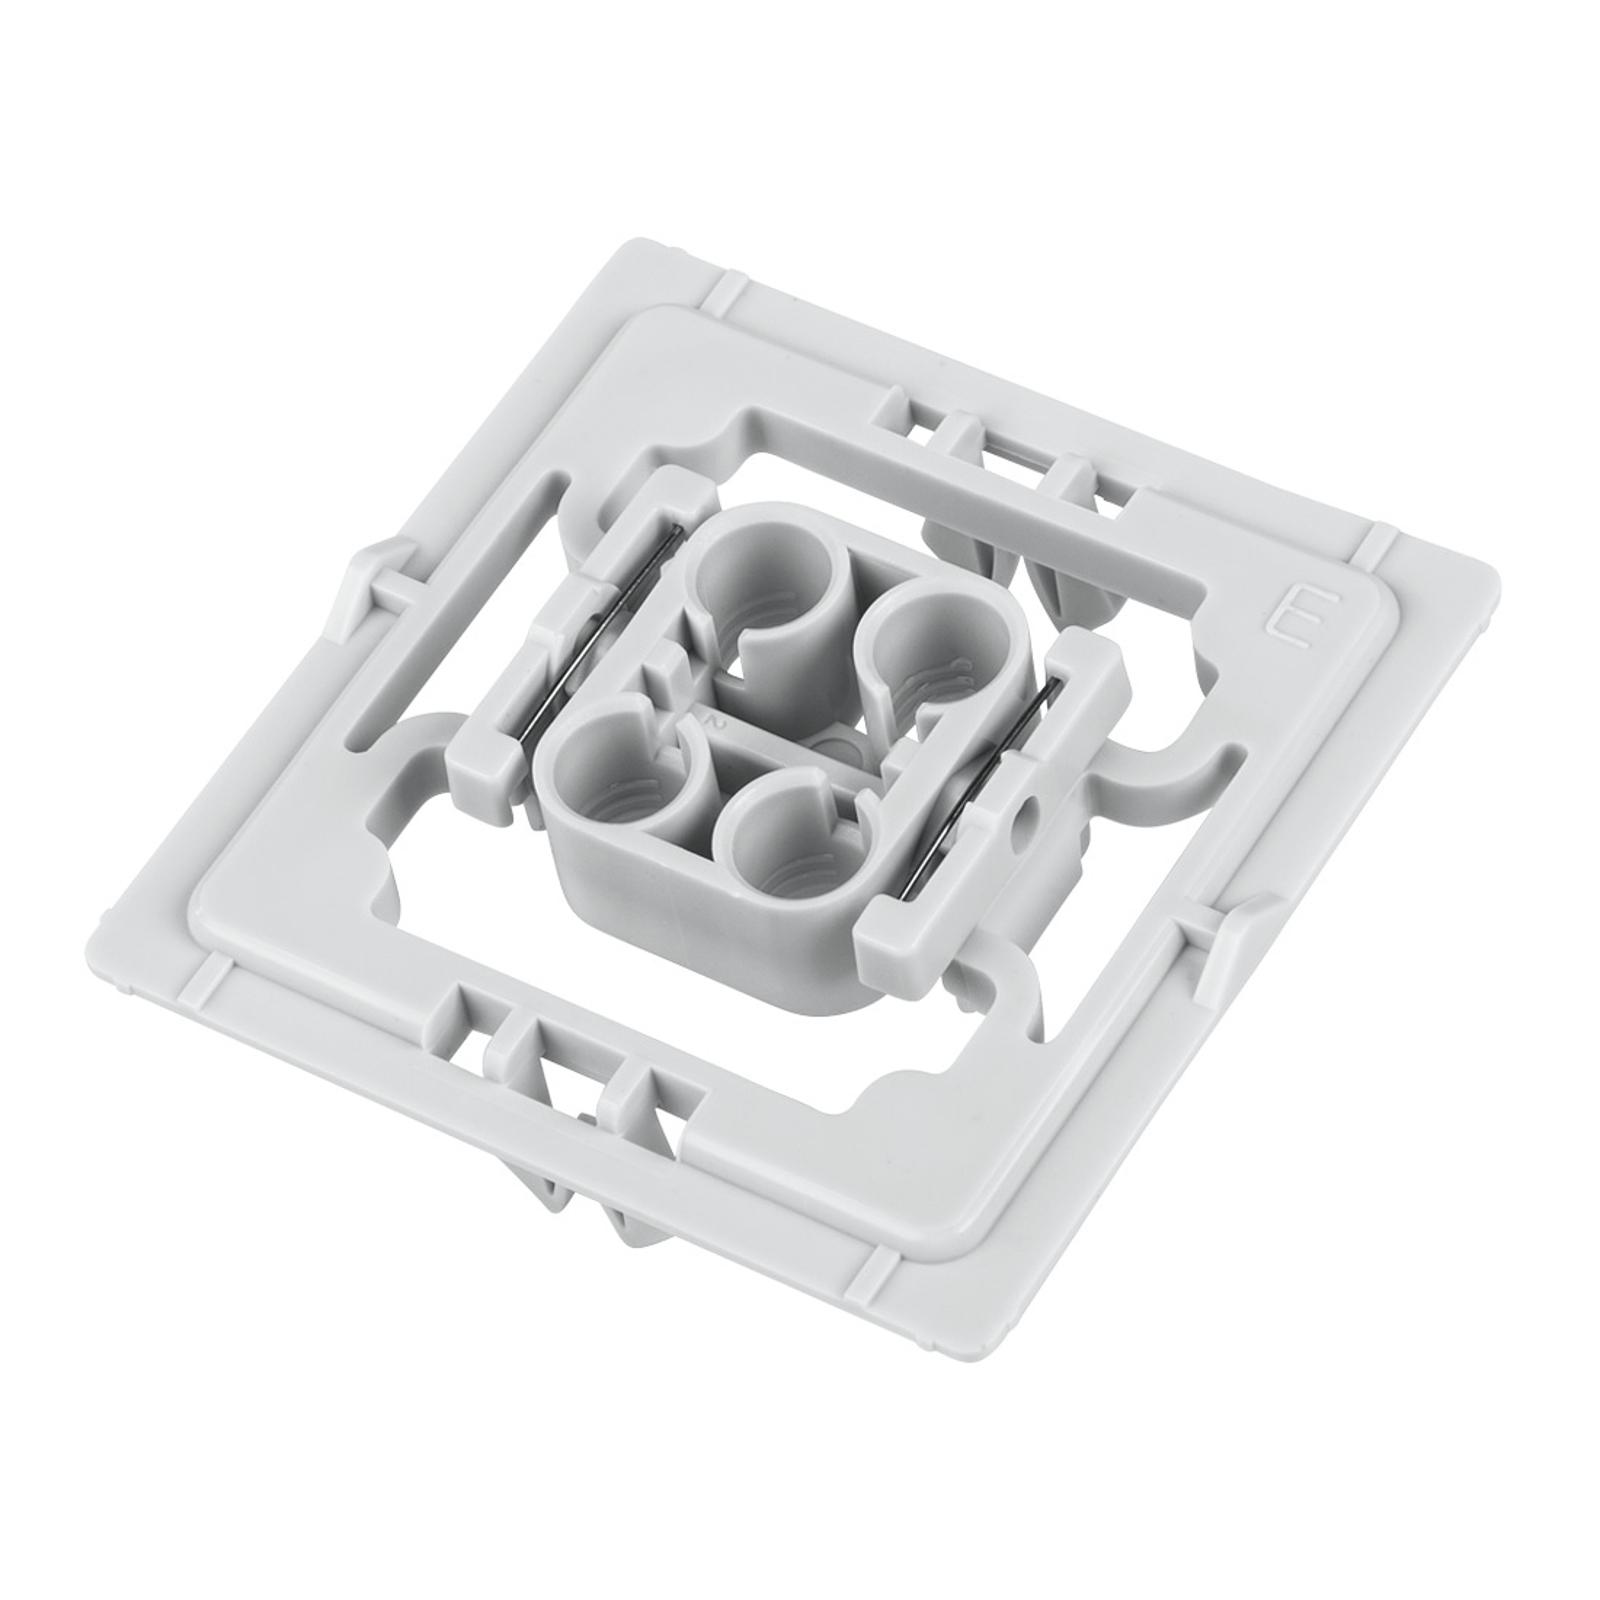 Homematic IP adaptateur interrupteurs ELSO Joy 1x